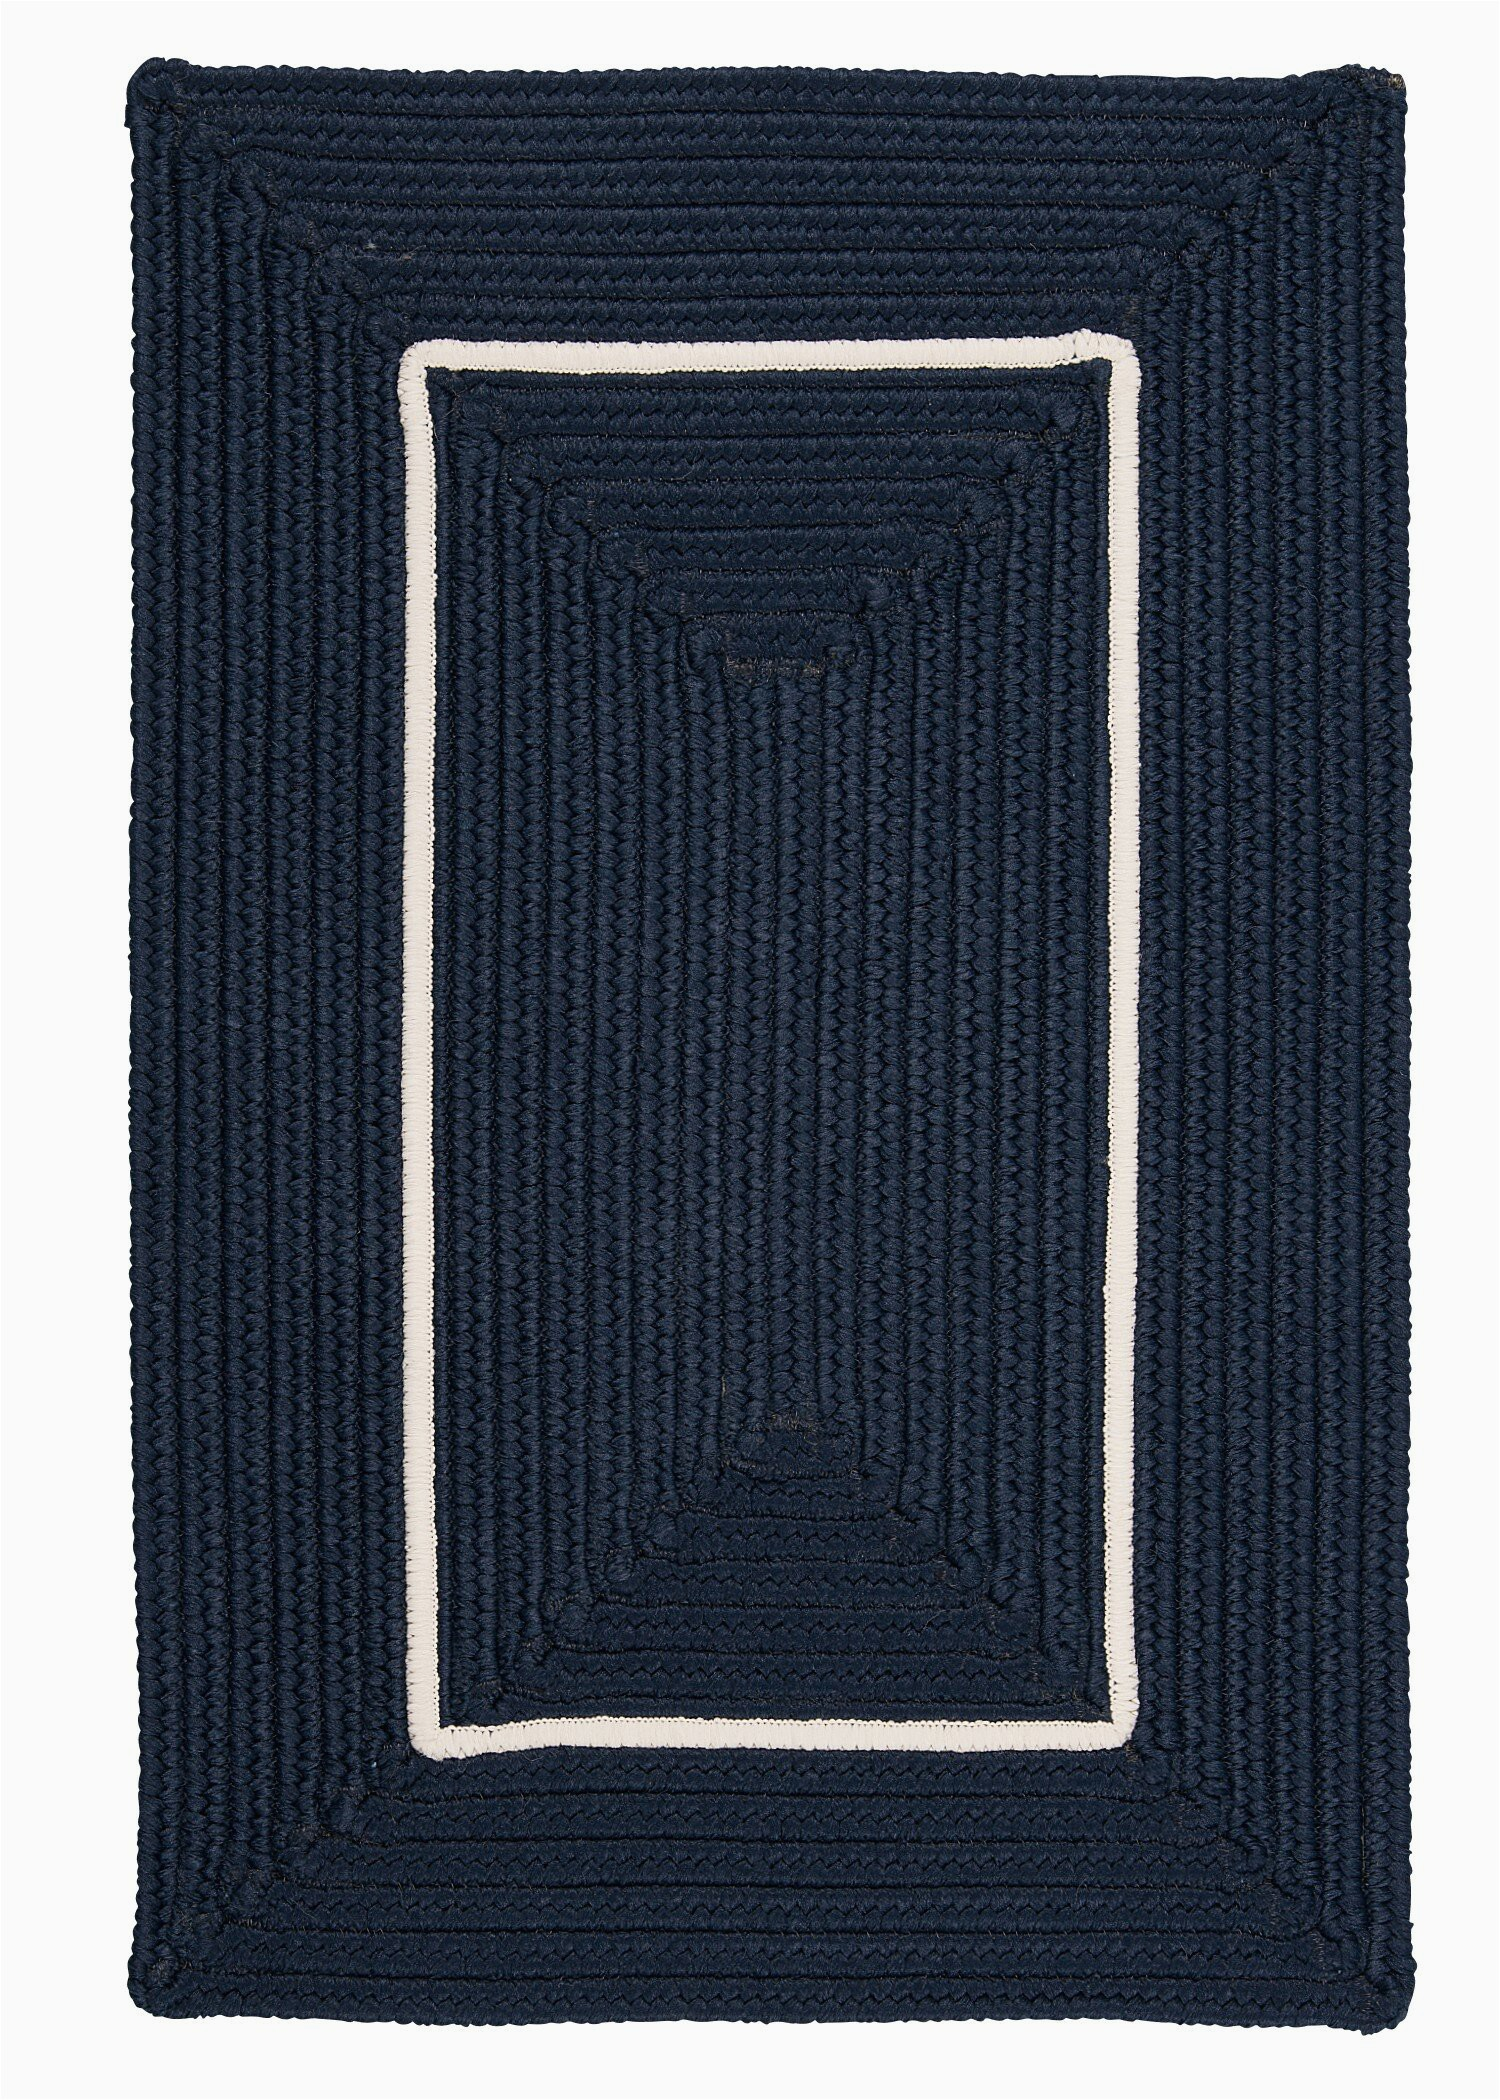 otis border in border braided navy indooroutdoor area rug